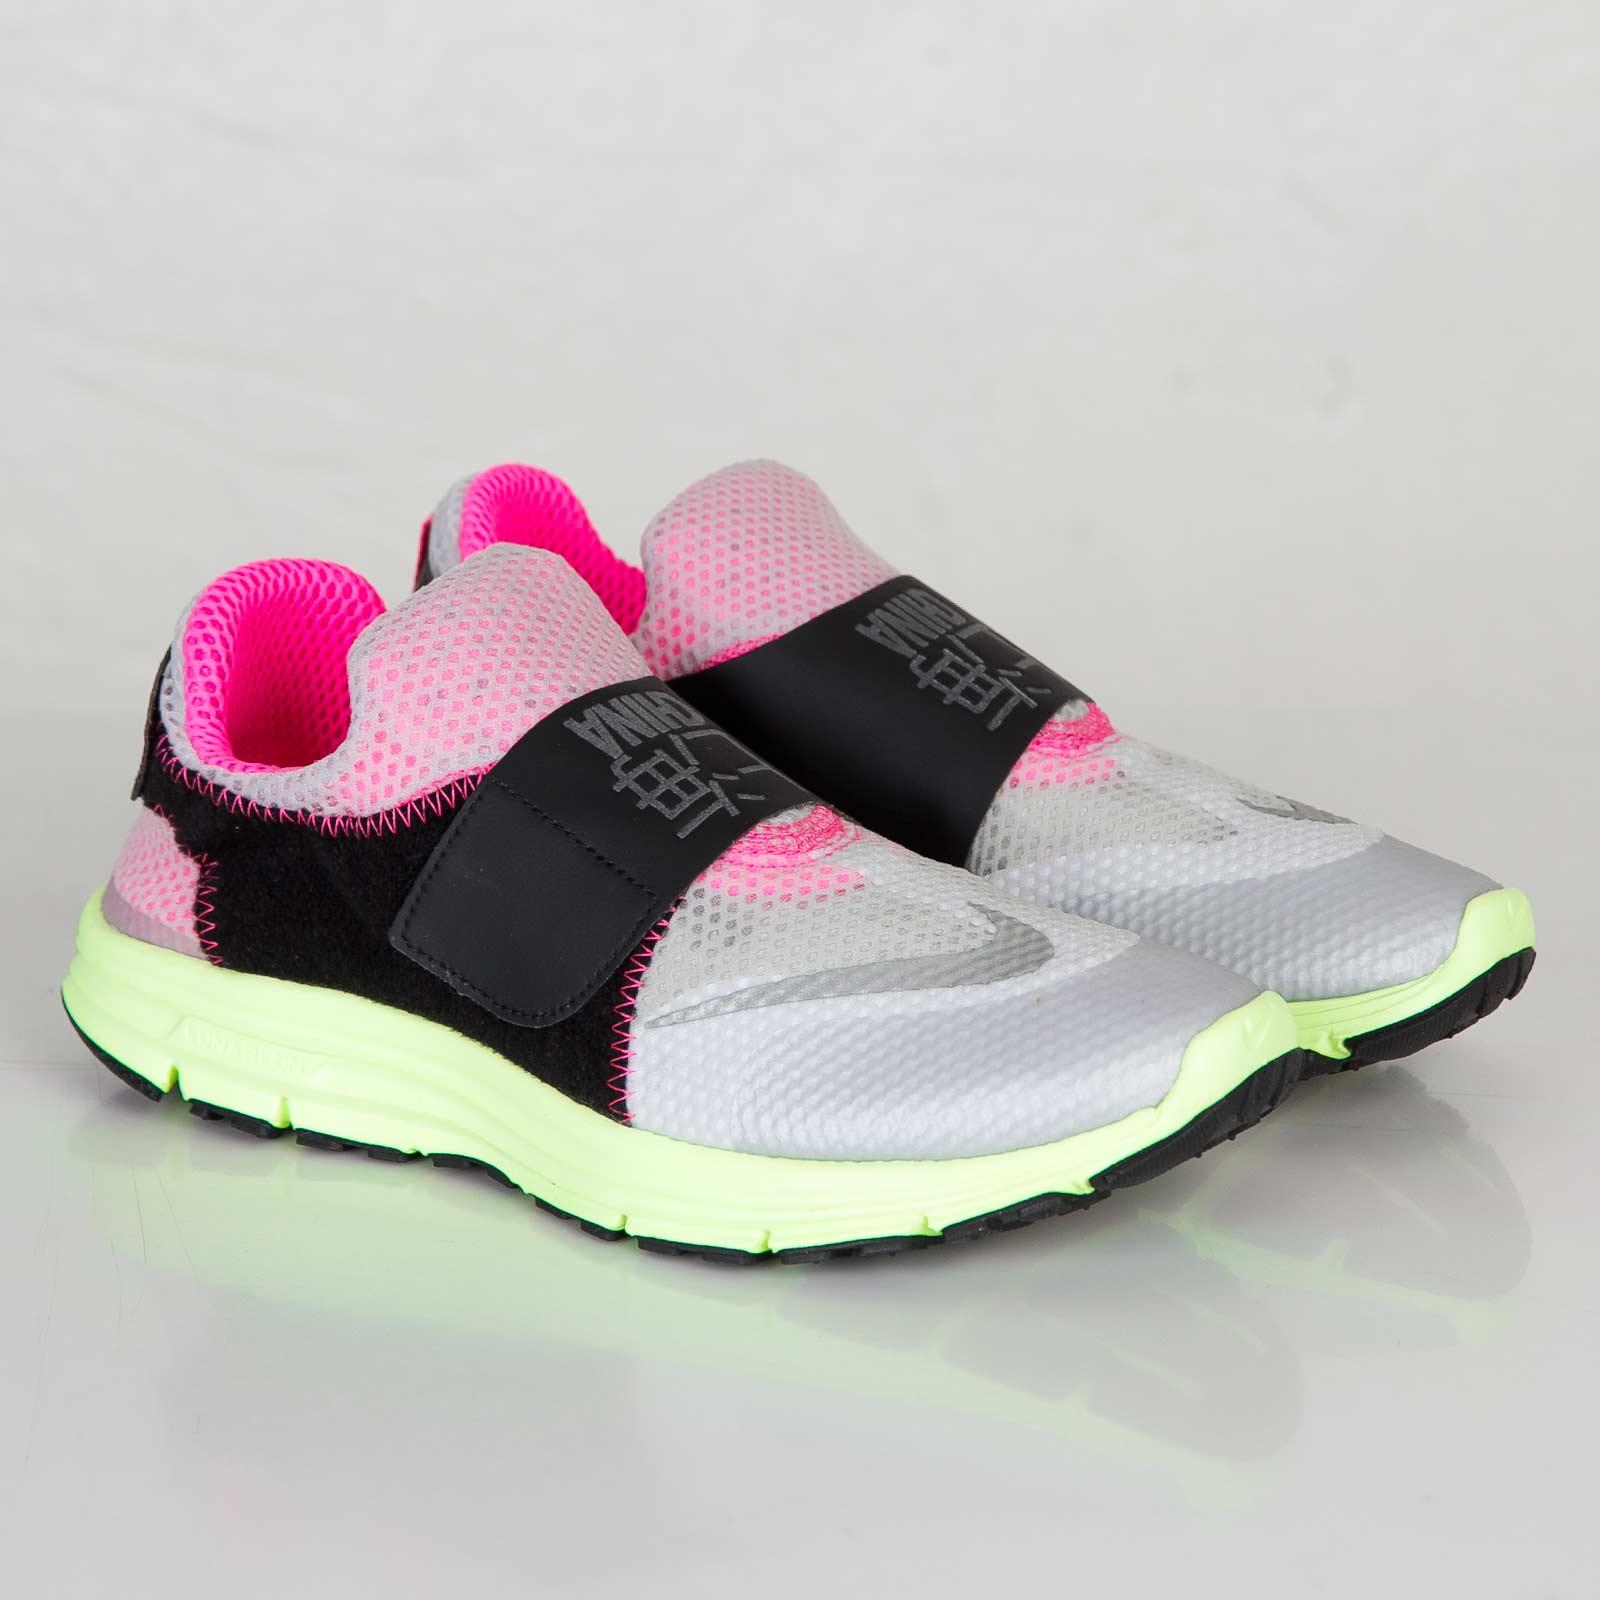 best website f7f17 3b7fd Nike Lunarfly 306 City QS